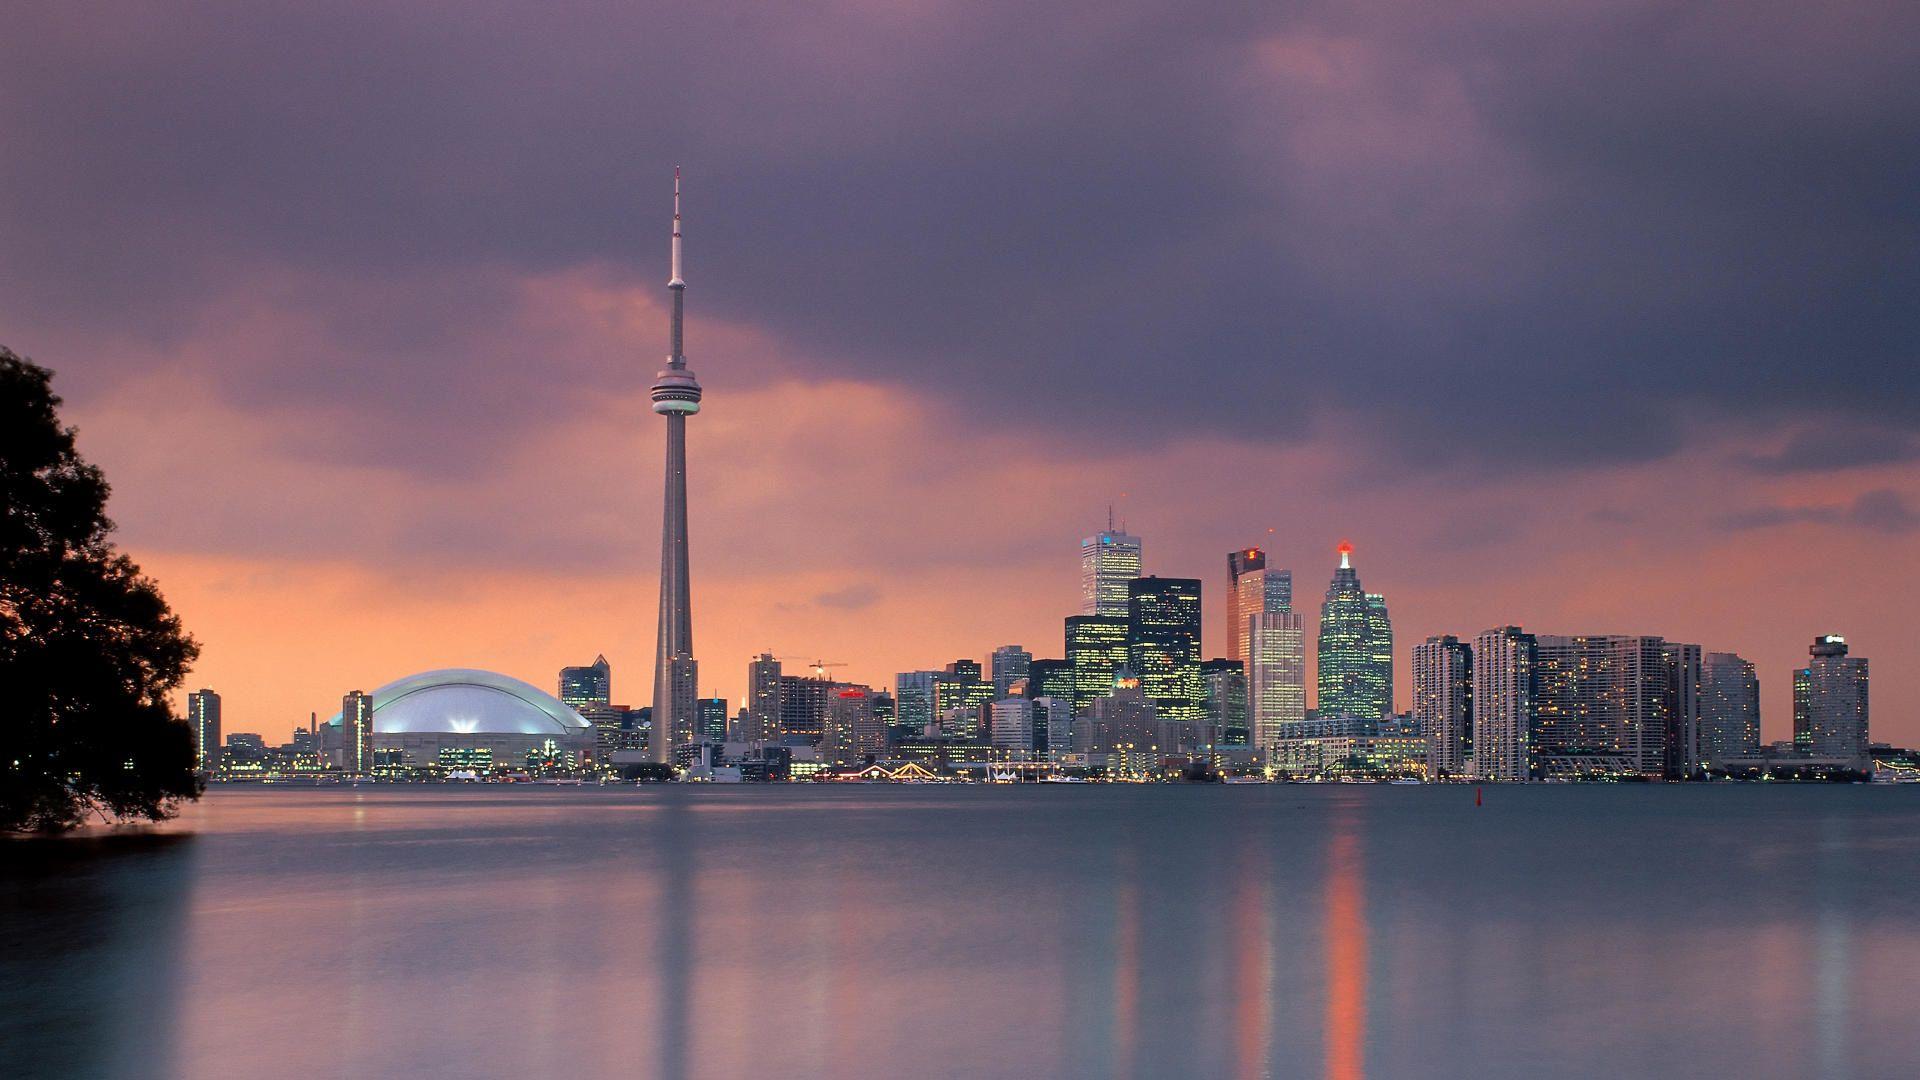 Toronto hd picture